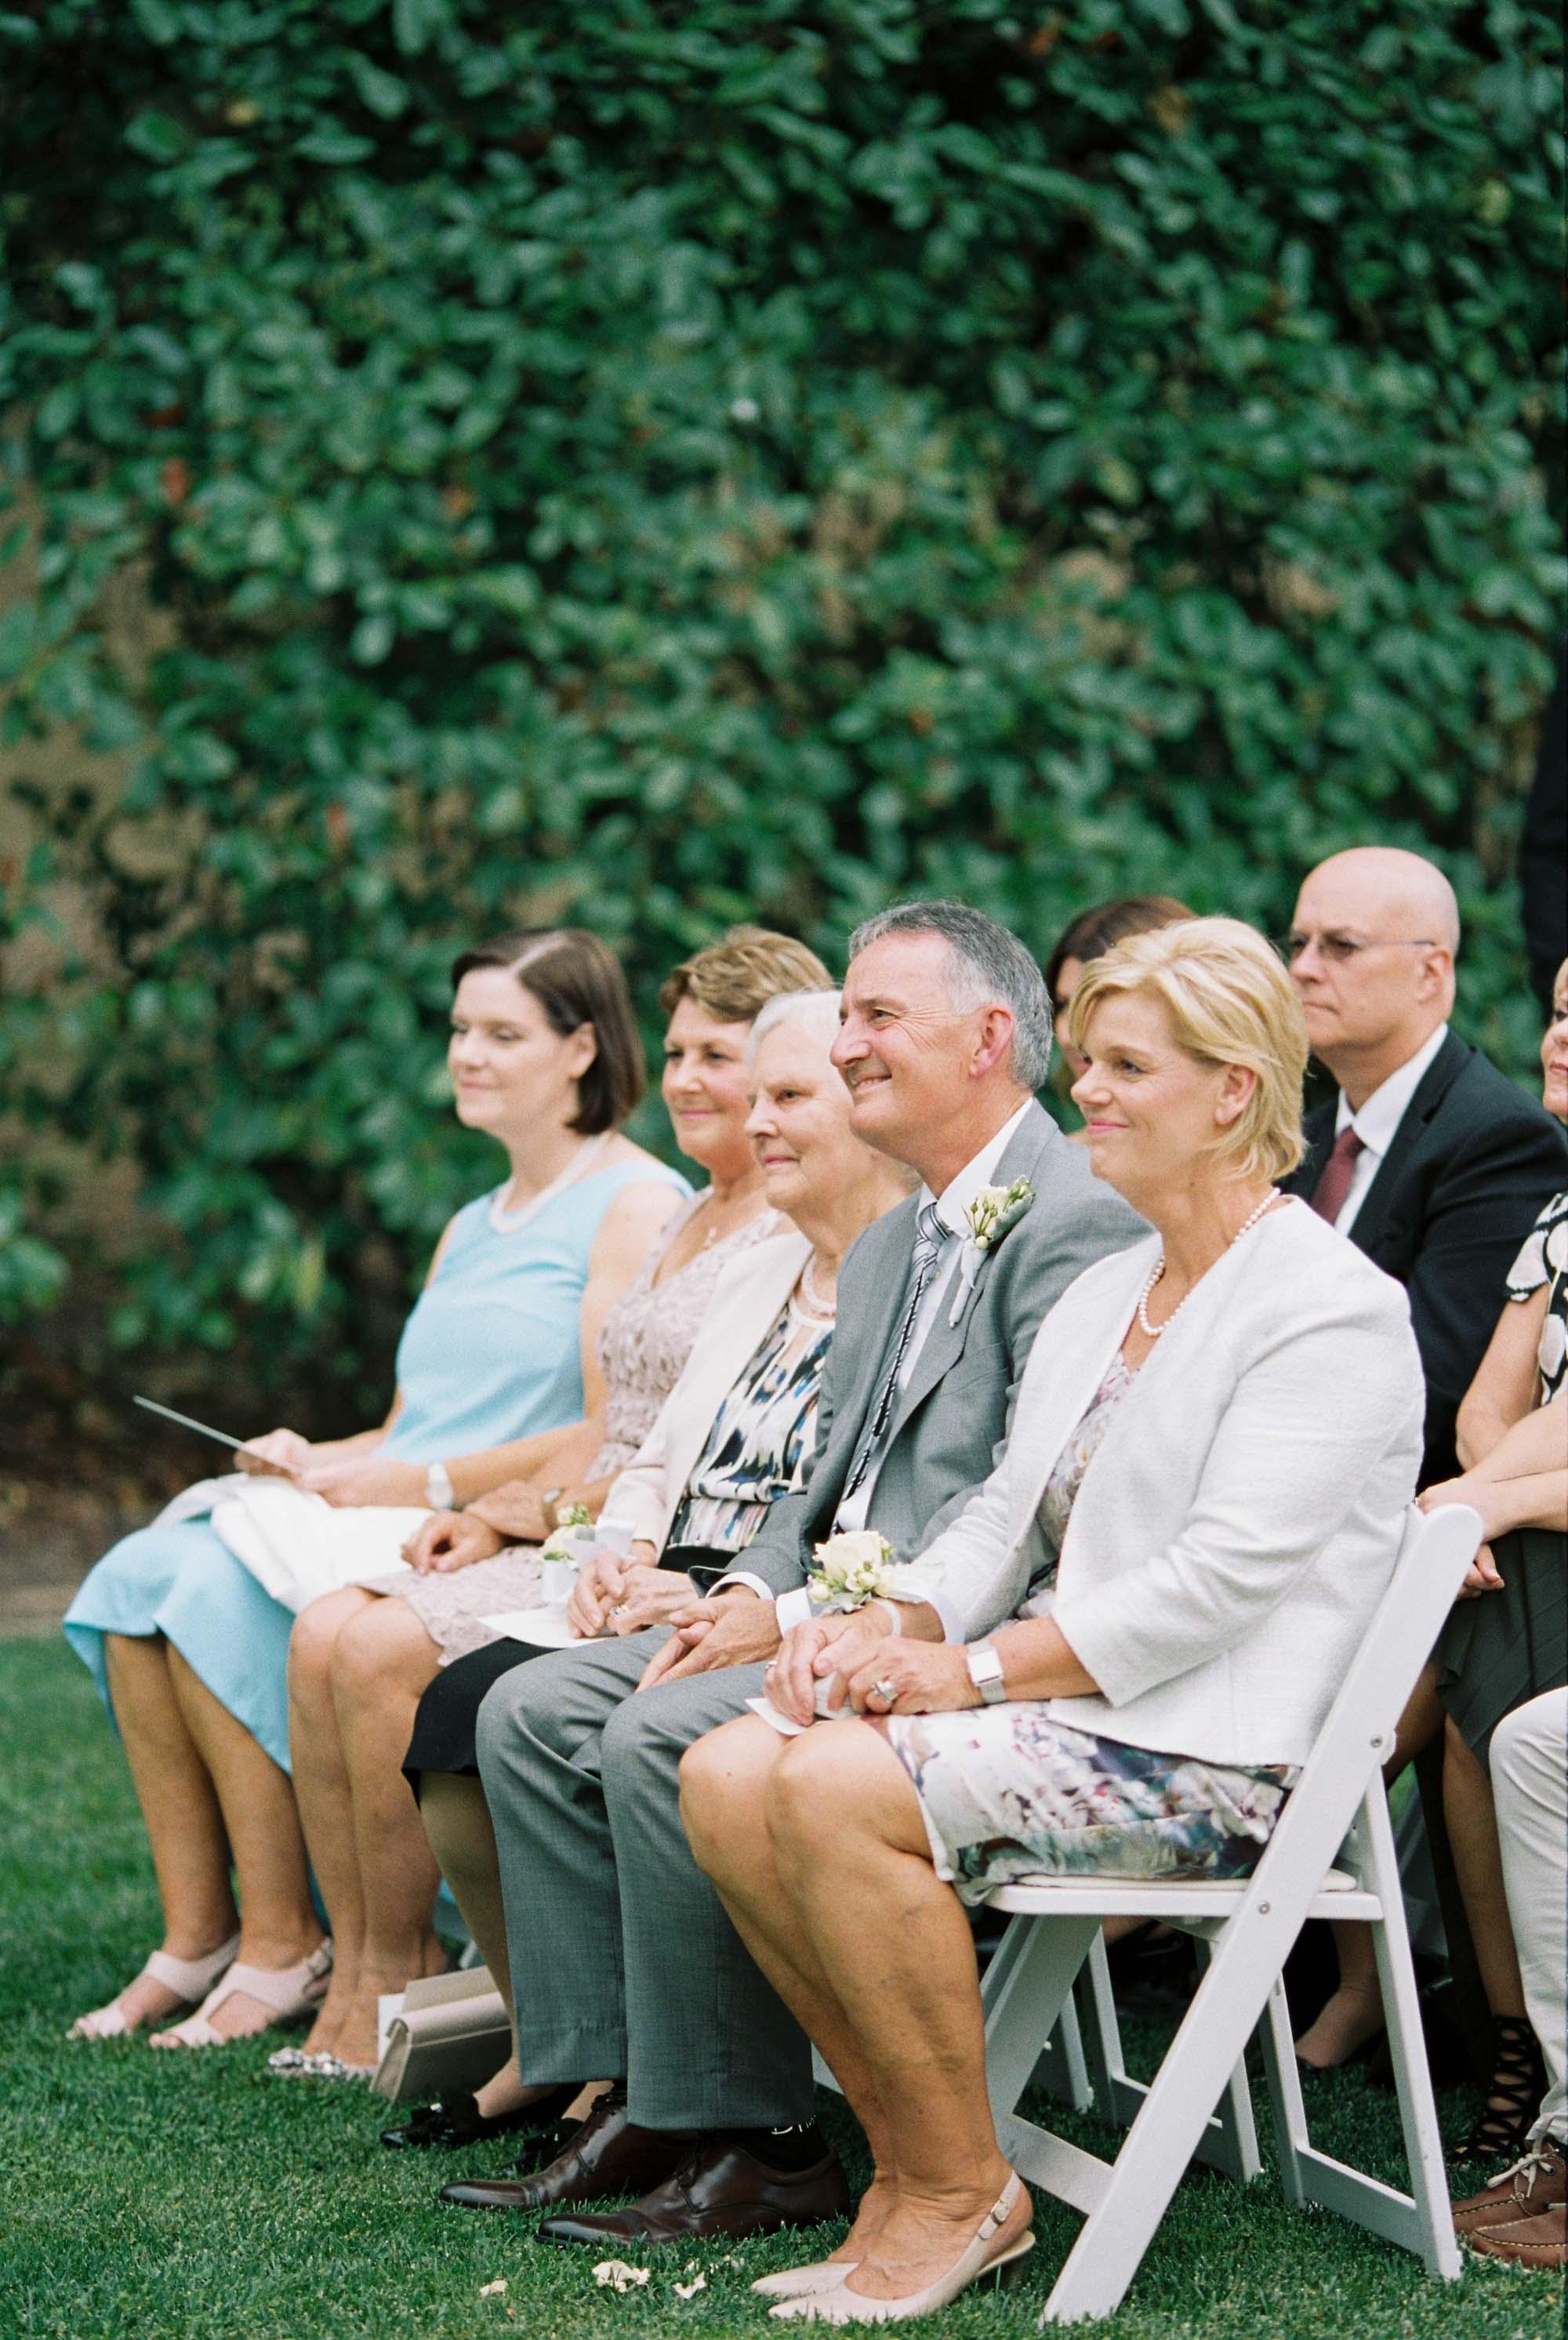 Golding-Wines-wedding-photography-054.jpg